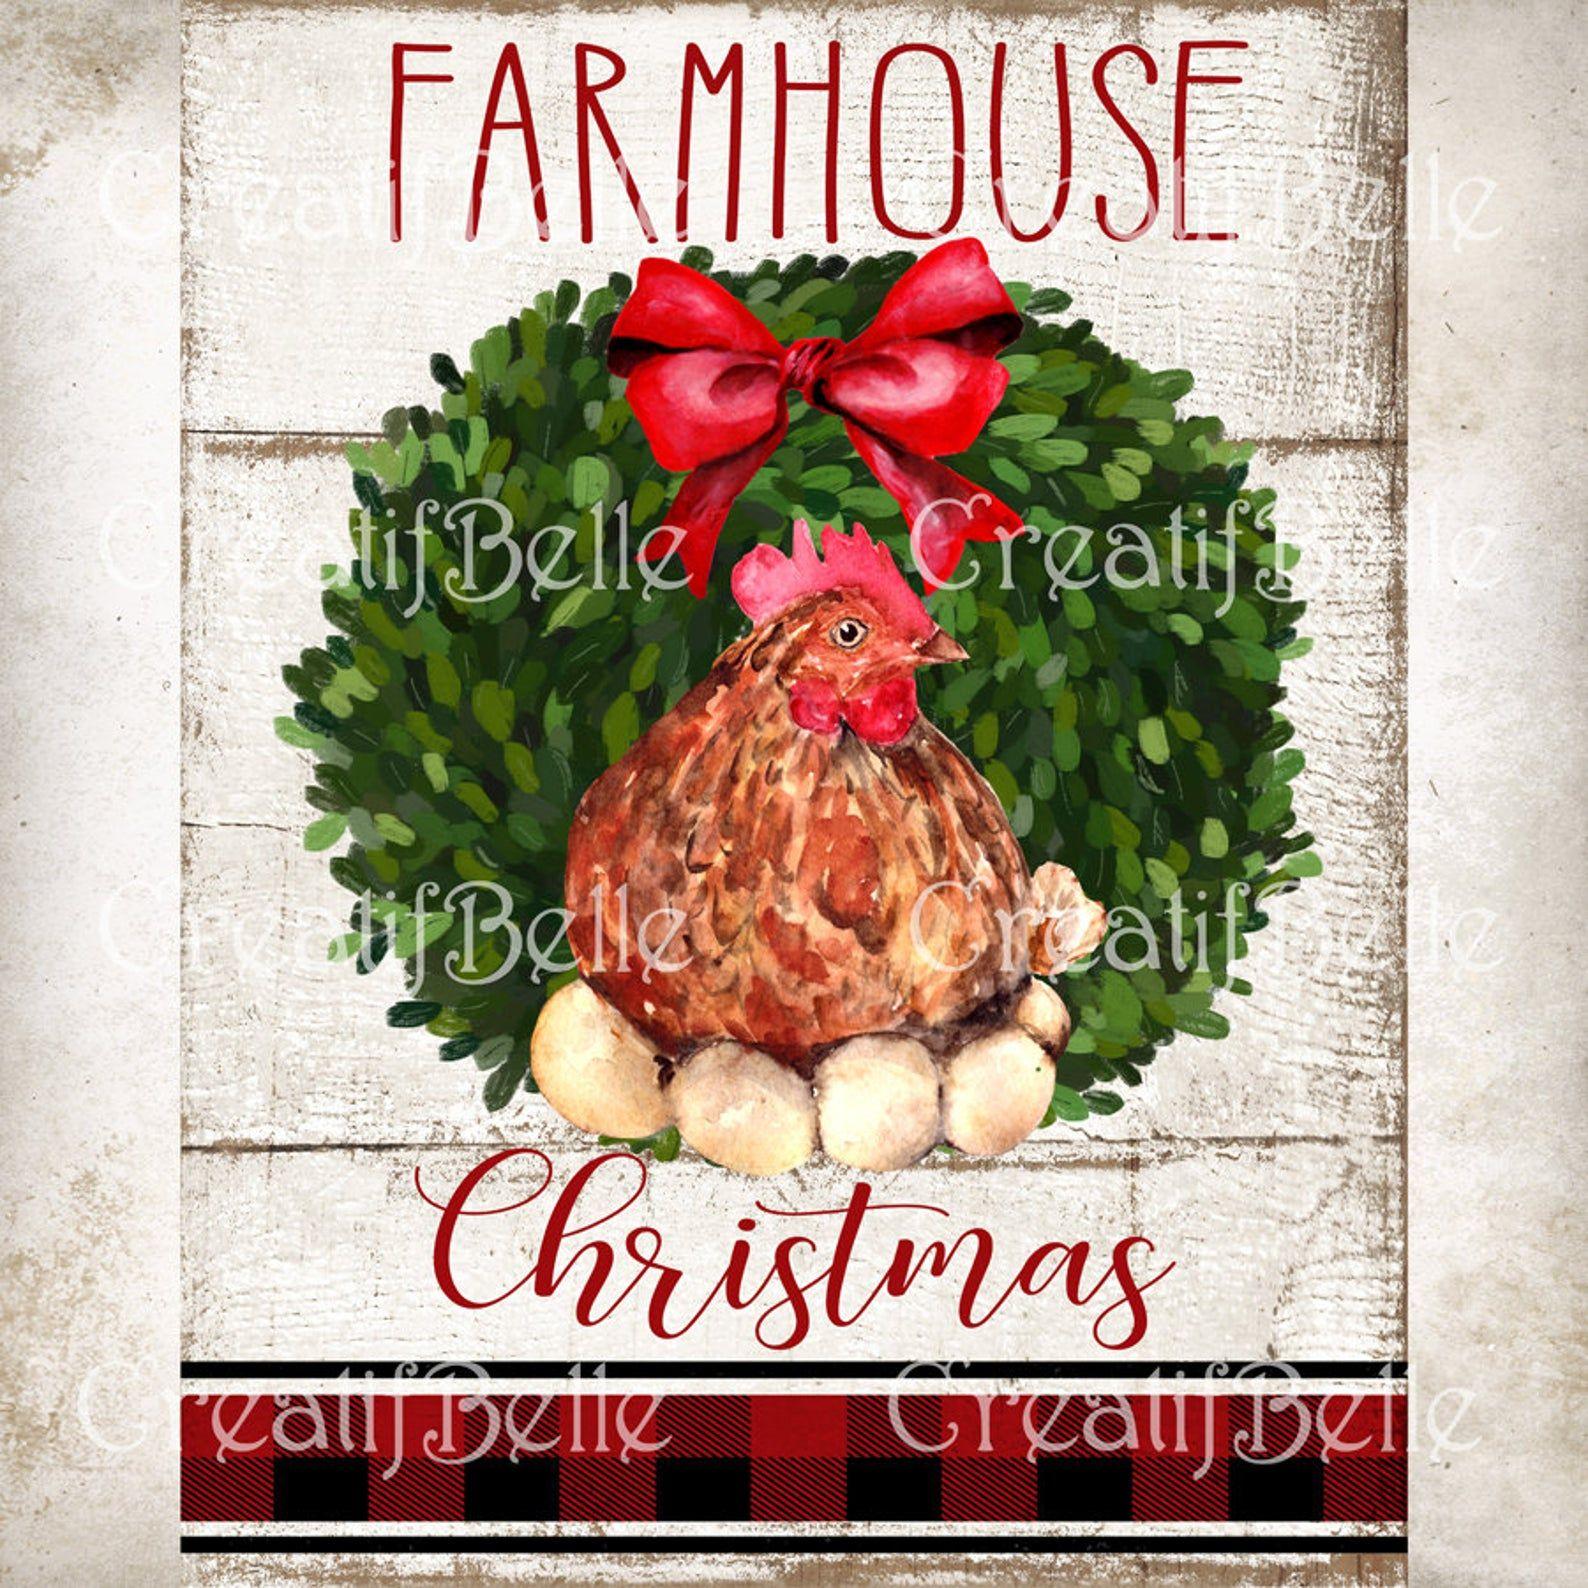 Farmhouse hen wreath sign farmhouse home decor sign wreath